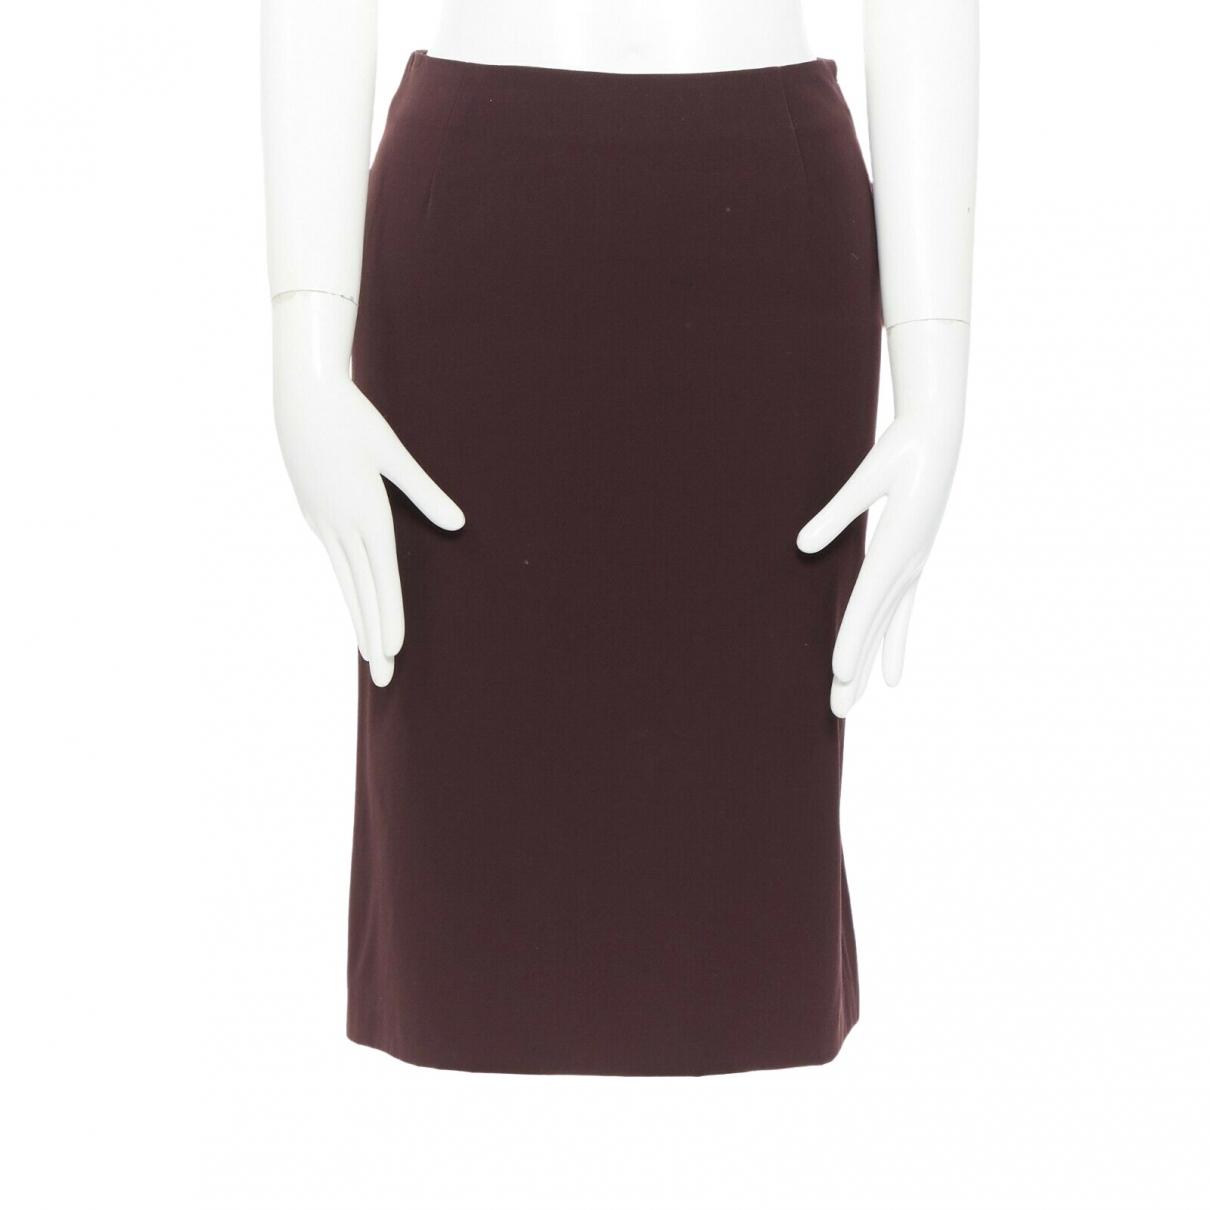 Narciso Rodriguez \N Brown Wool skirt for Women 38 IT